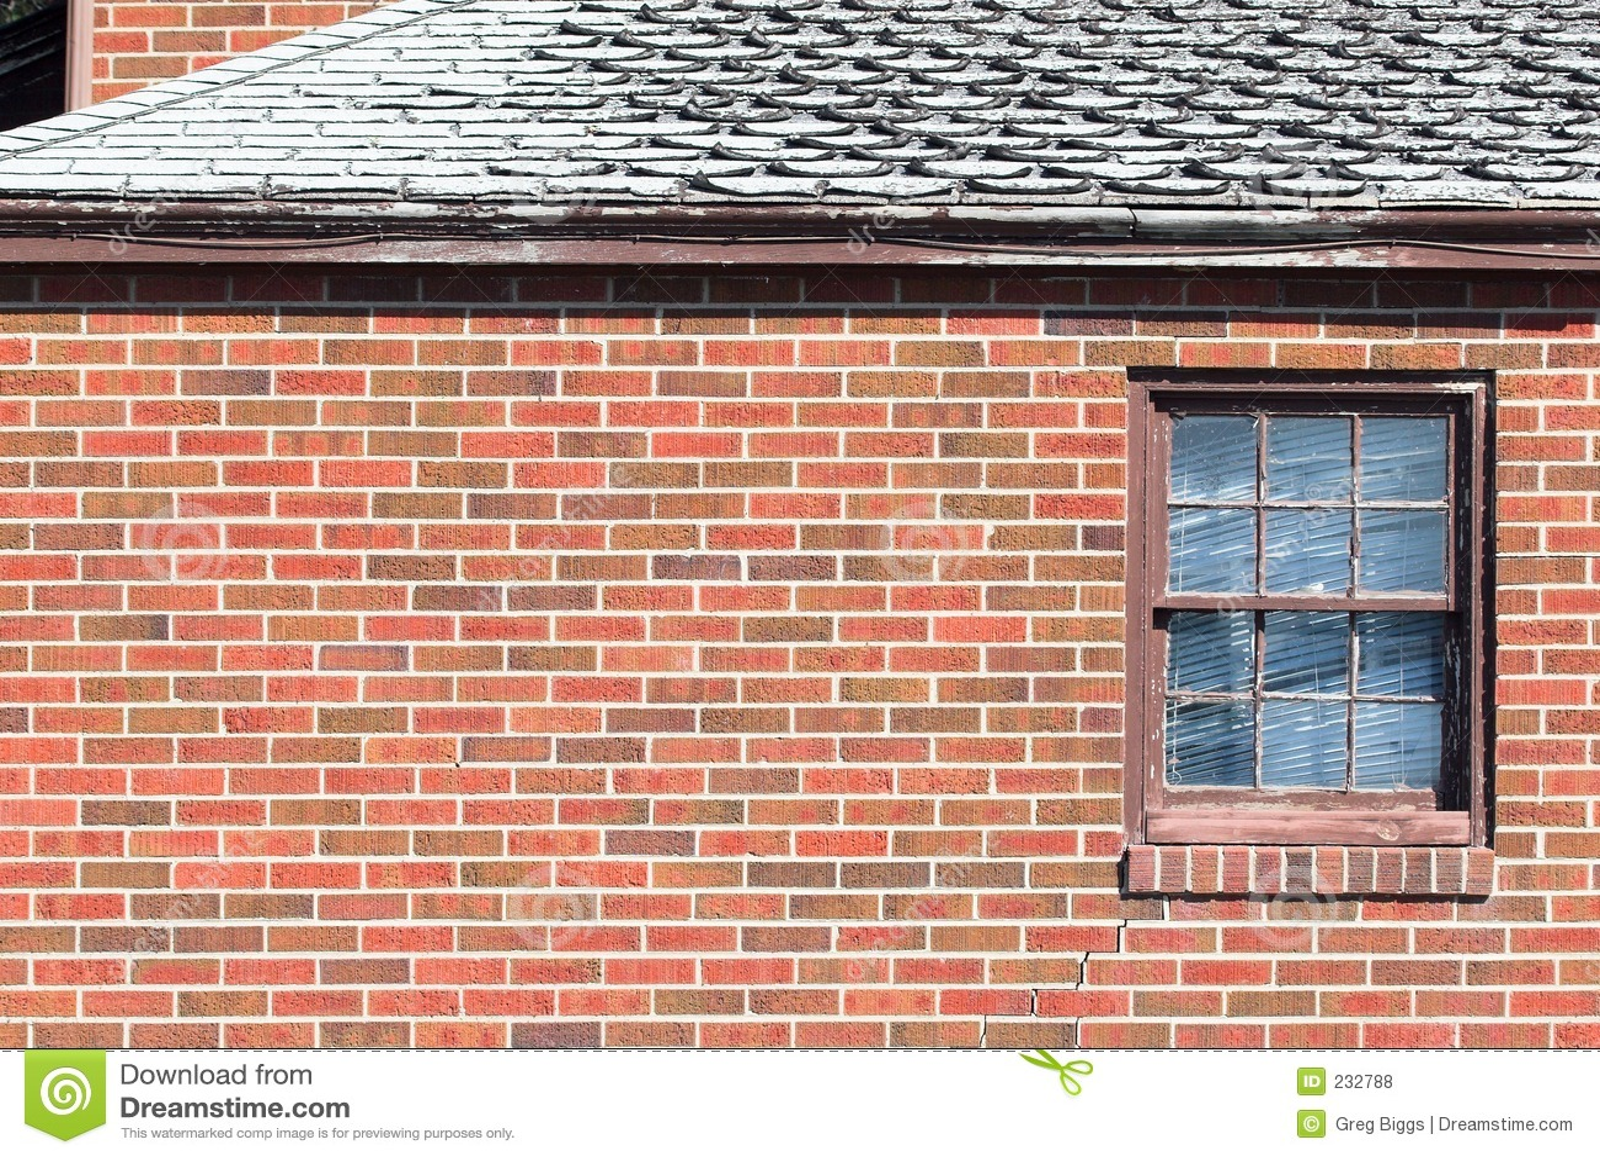 brick wall window royalty free stock photos